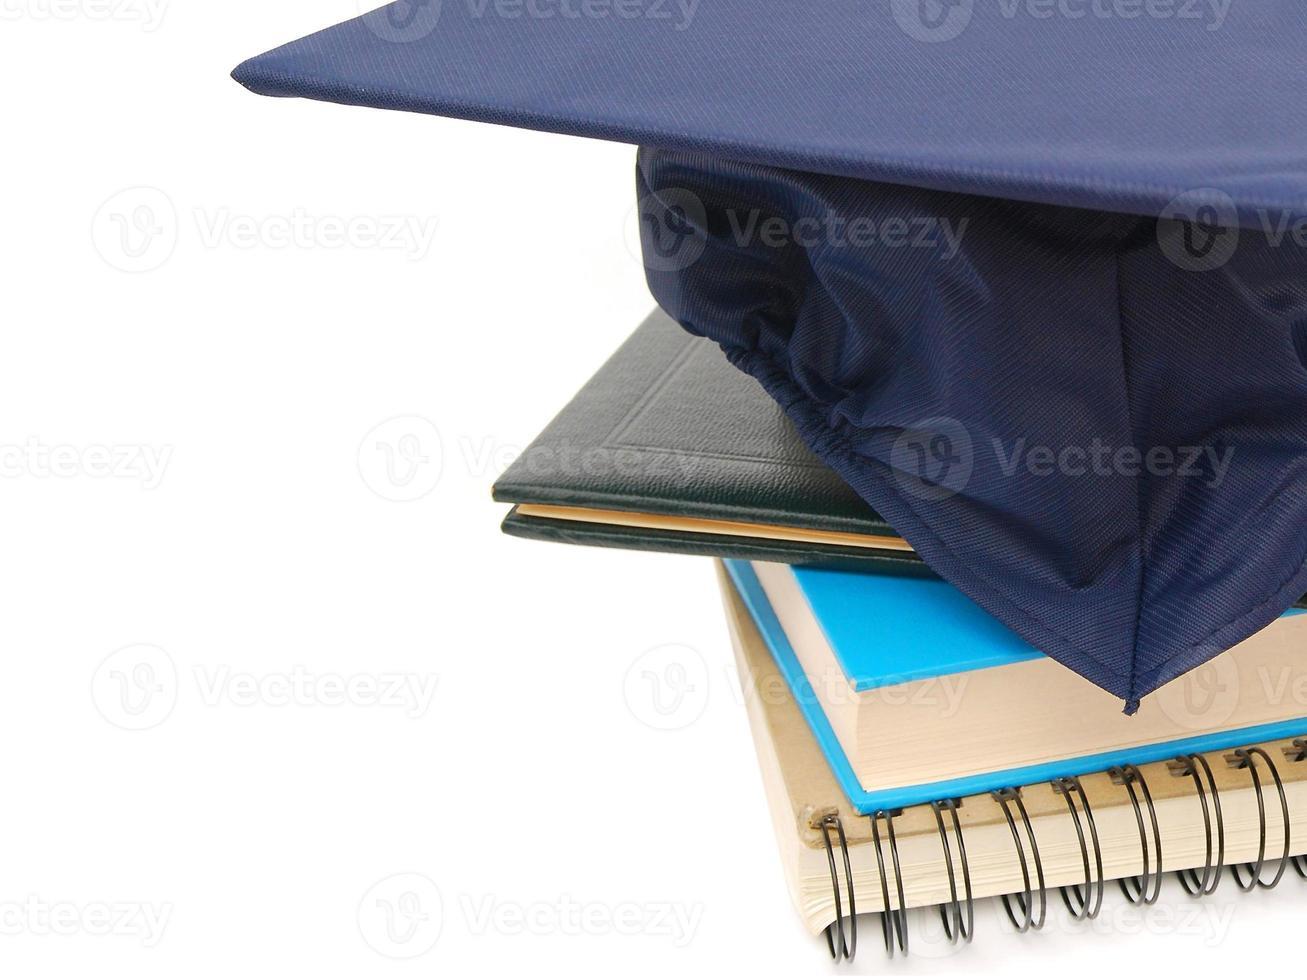 completing graduation photo